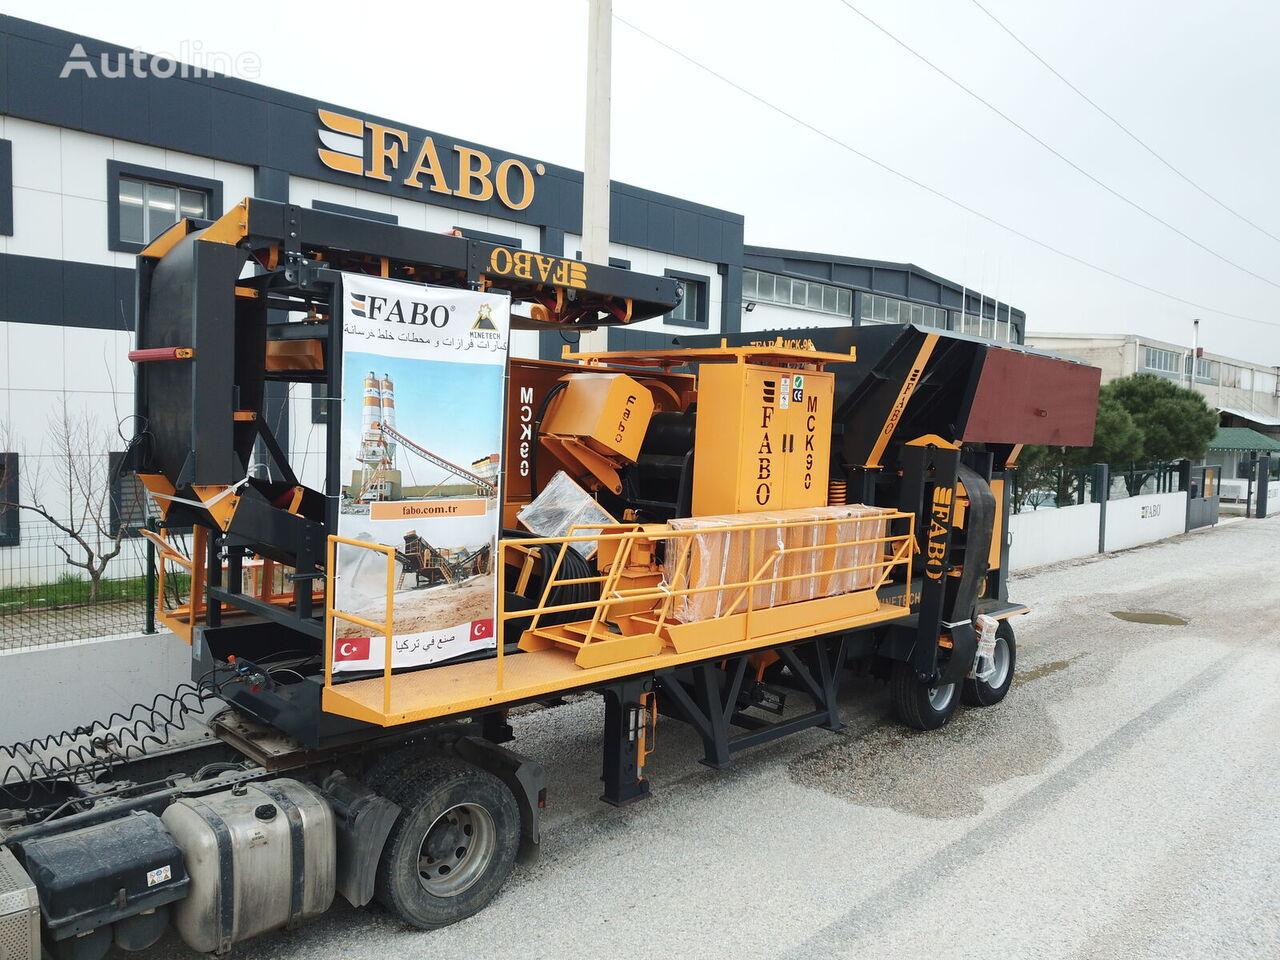 FABO MCK-90 MOBILE CRUSHING & SCREENING PLANT FOR BASALT planta trituradora móvil nueva